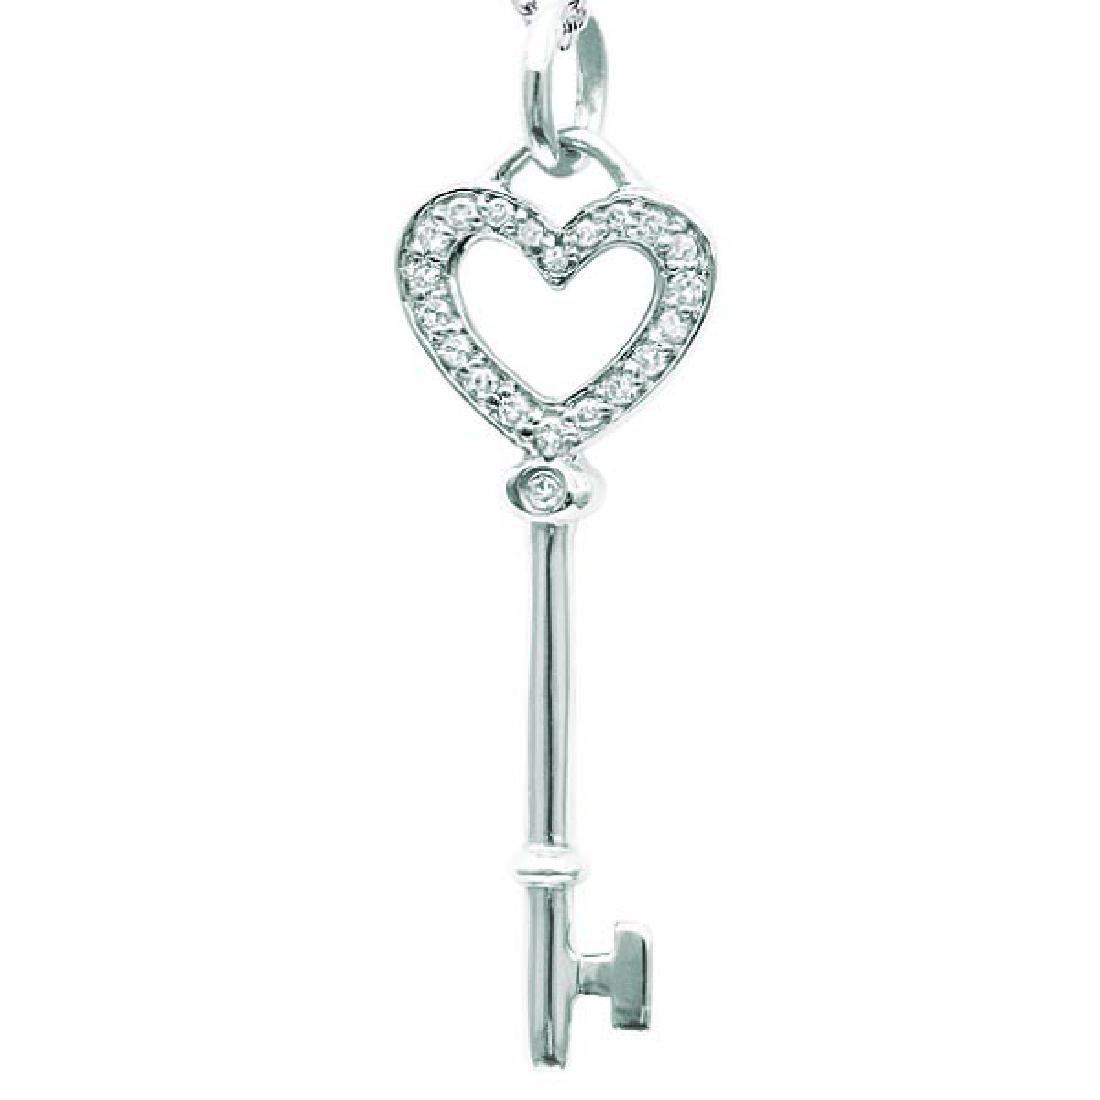 Diamond Heart Key Pendant Necklace in Sterling Silver (